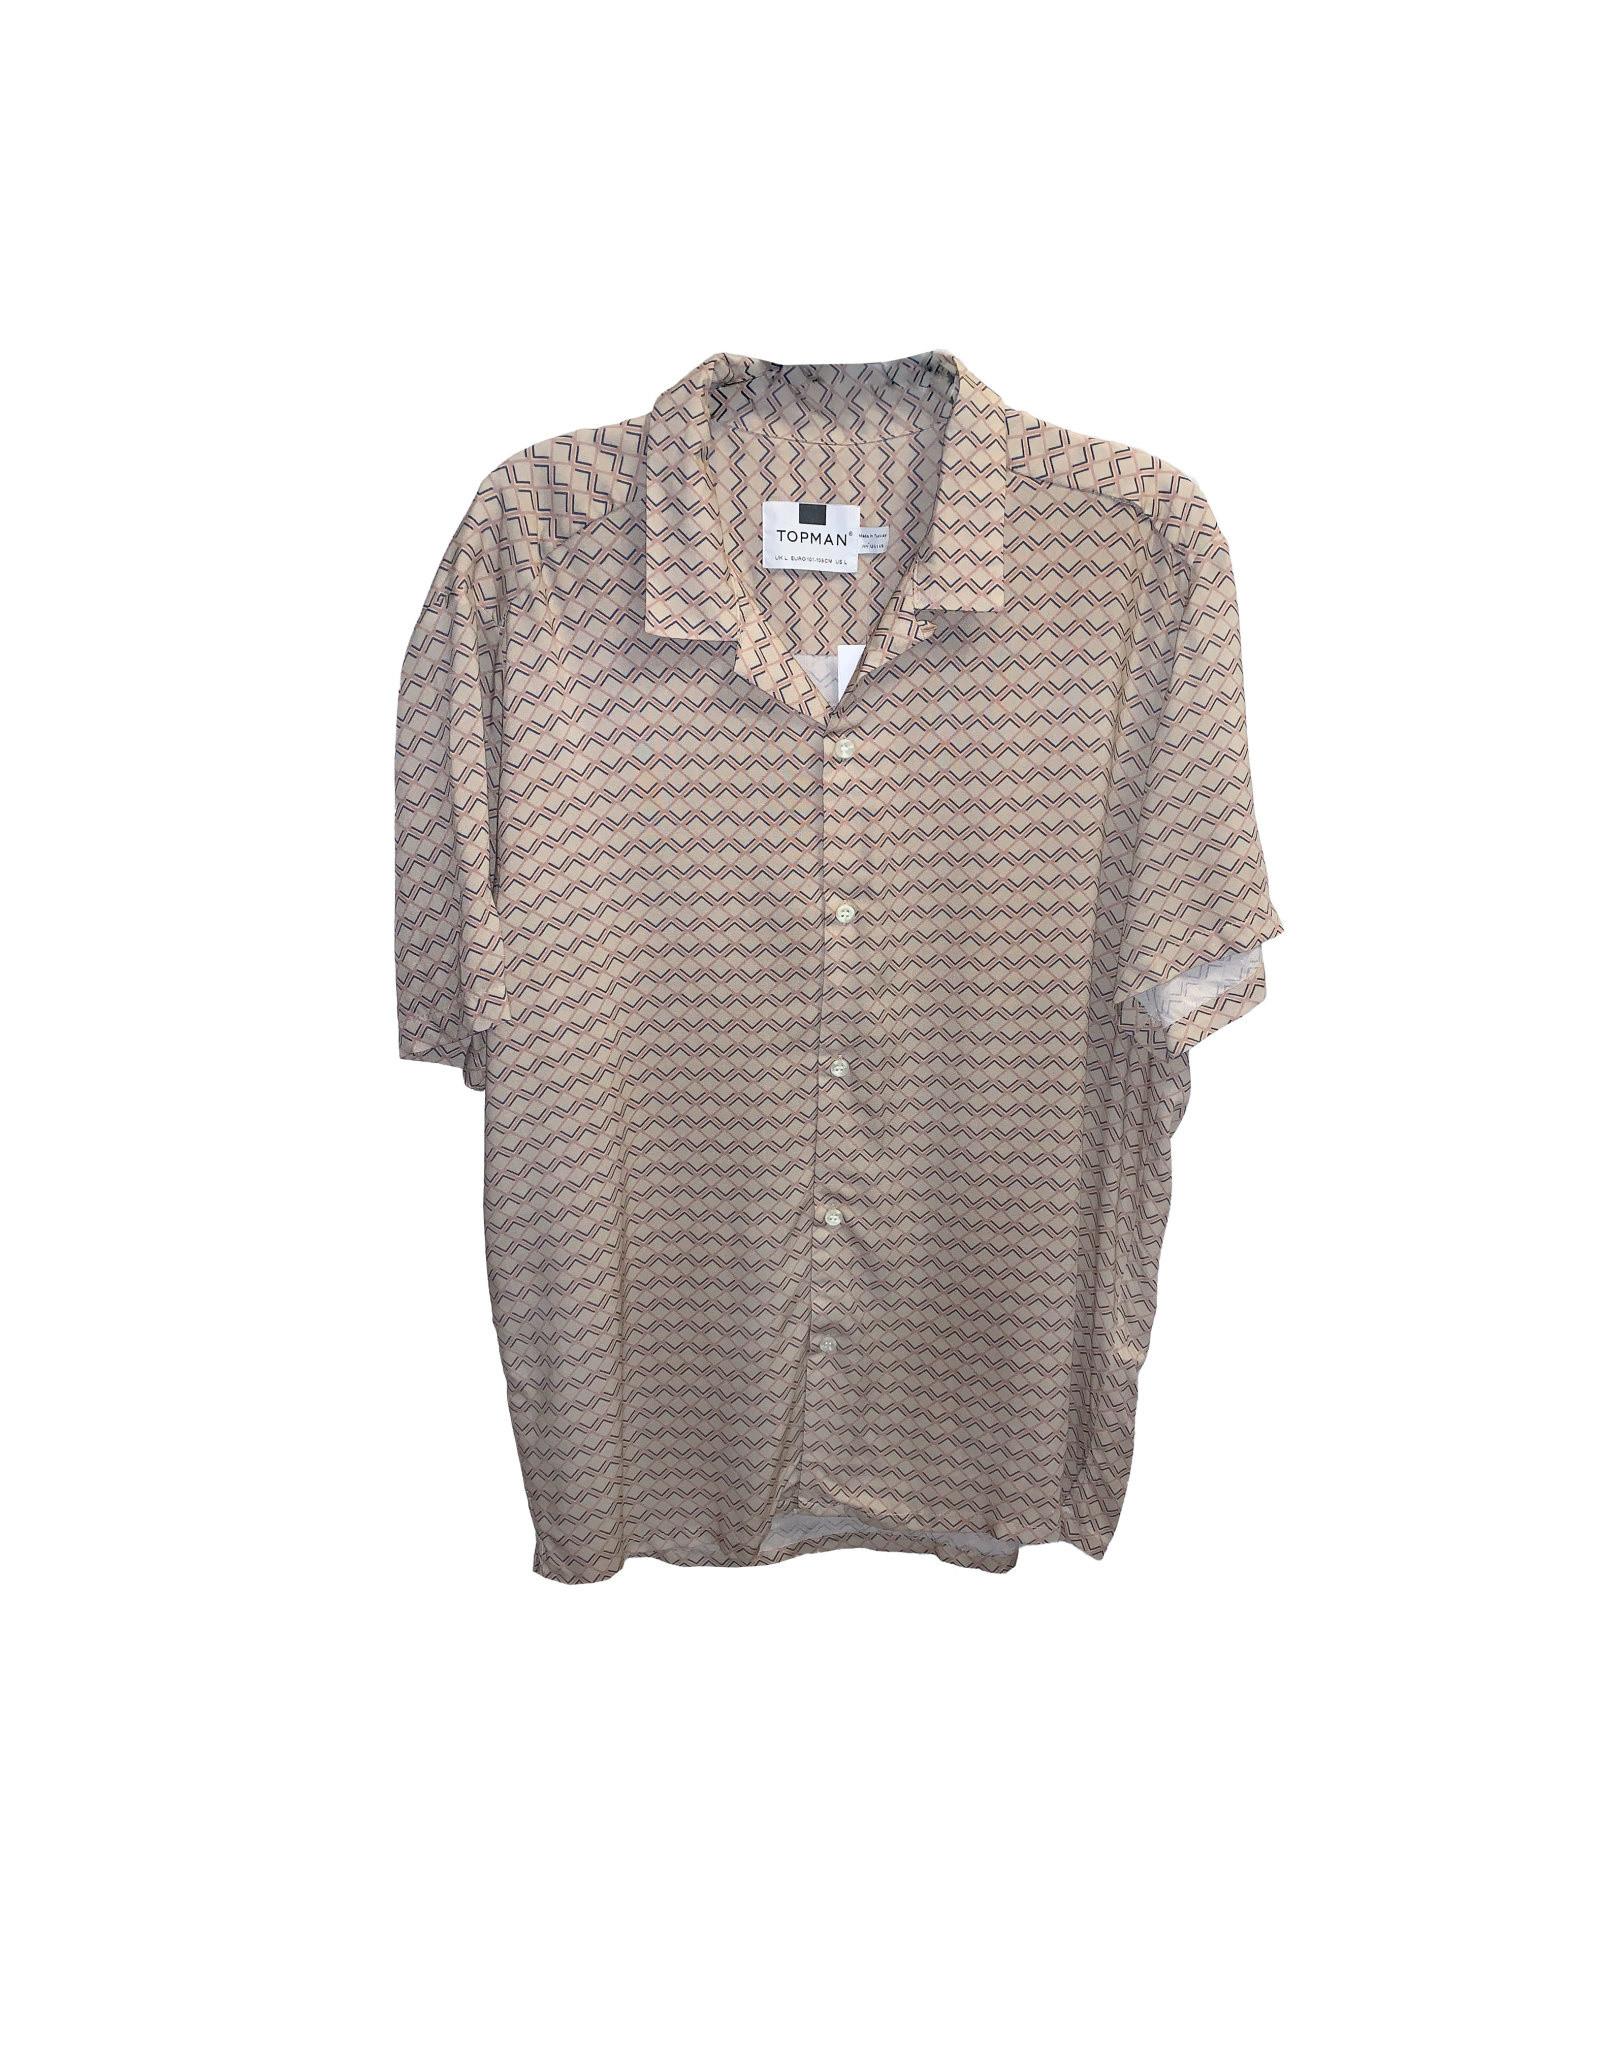 TOPMAN Topman  Stripe Short  Sleeve  Shirt  Size L